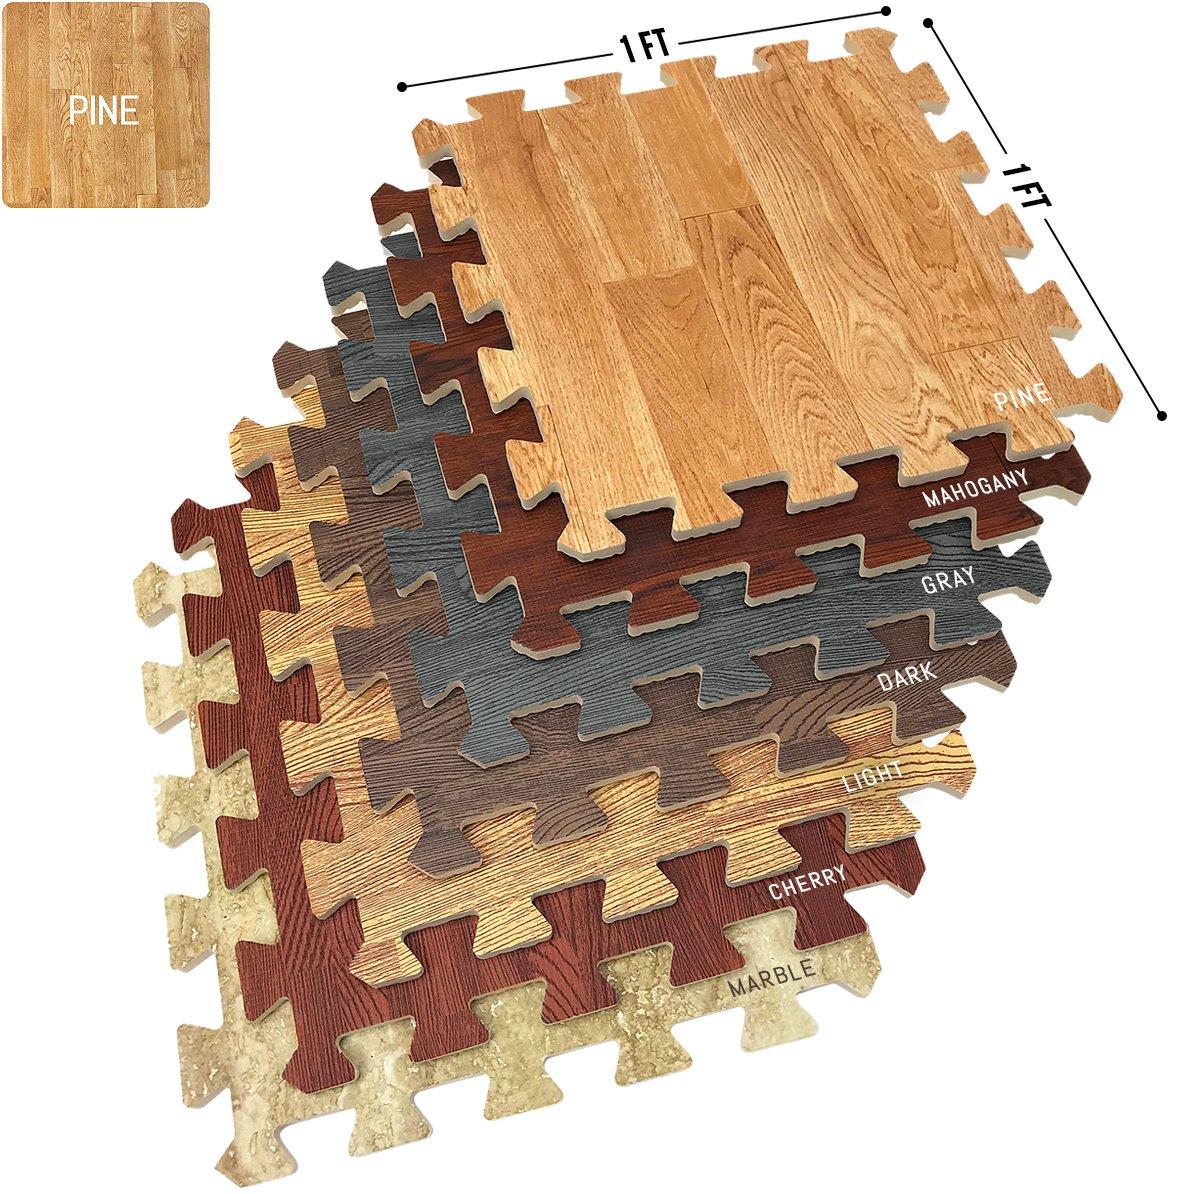 Sorbus Wood Grain Floor Mats Foam Interlocking Mats Each Tile 1 Square Foot 3/8-Inch Thick Flooring Wood Mat Tiles - Home Office Playroom Basement Trade Show (16 Tiles,16 Sq ft, Wood Grain - Pine) by Sorbus